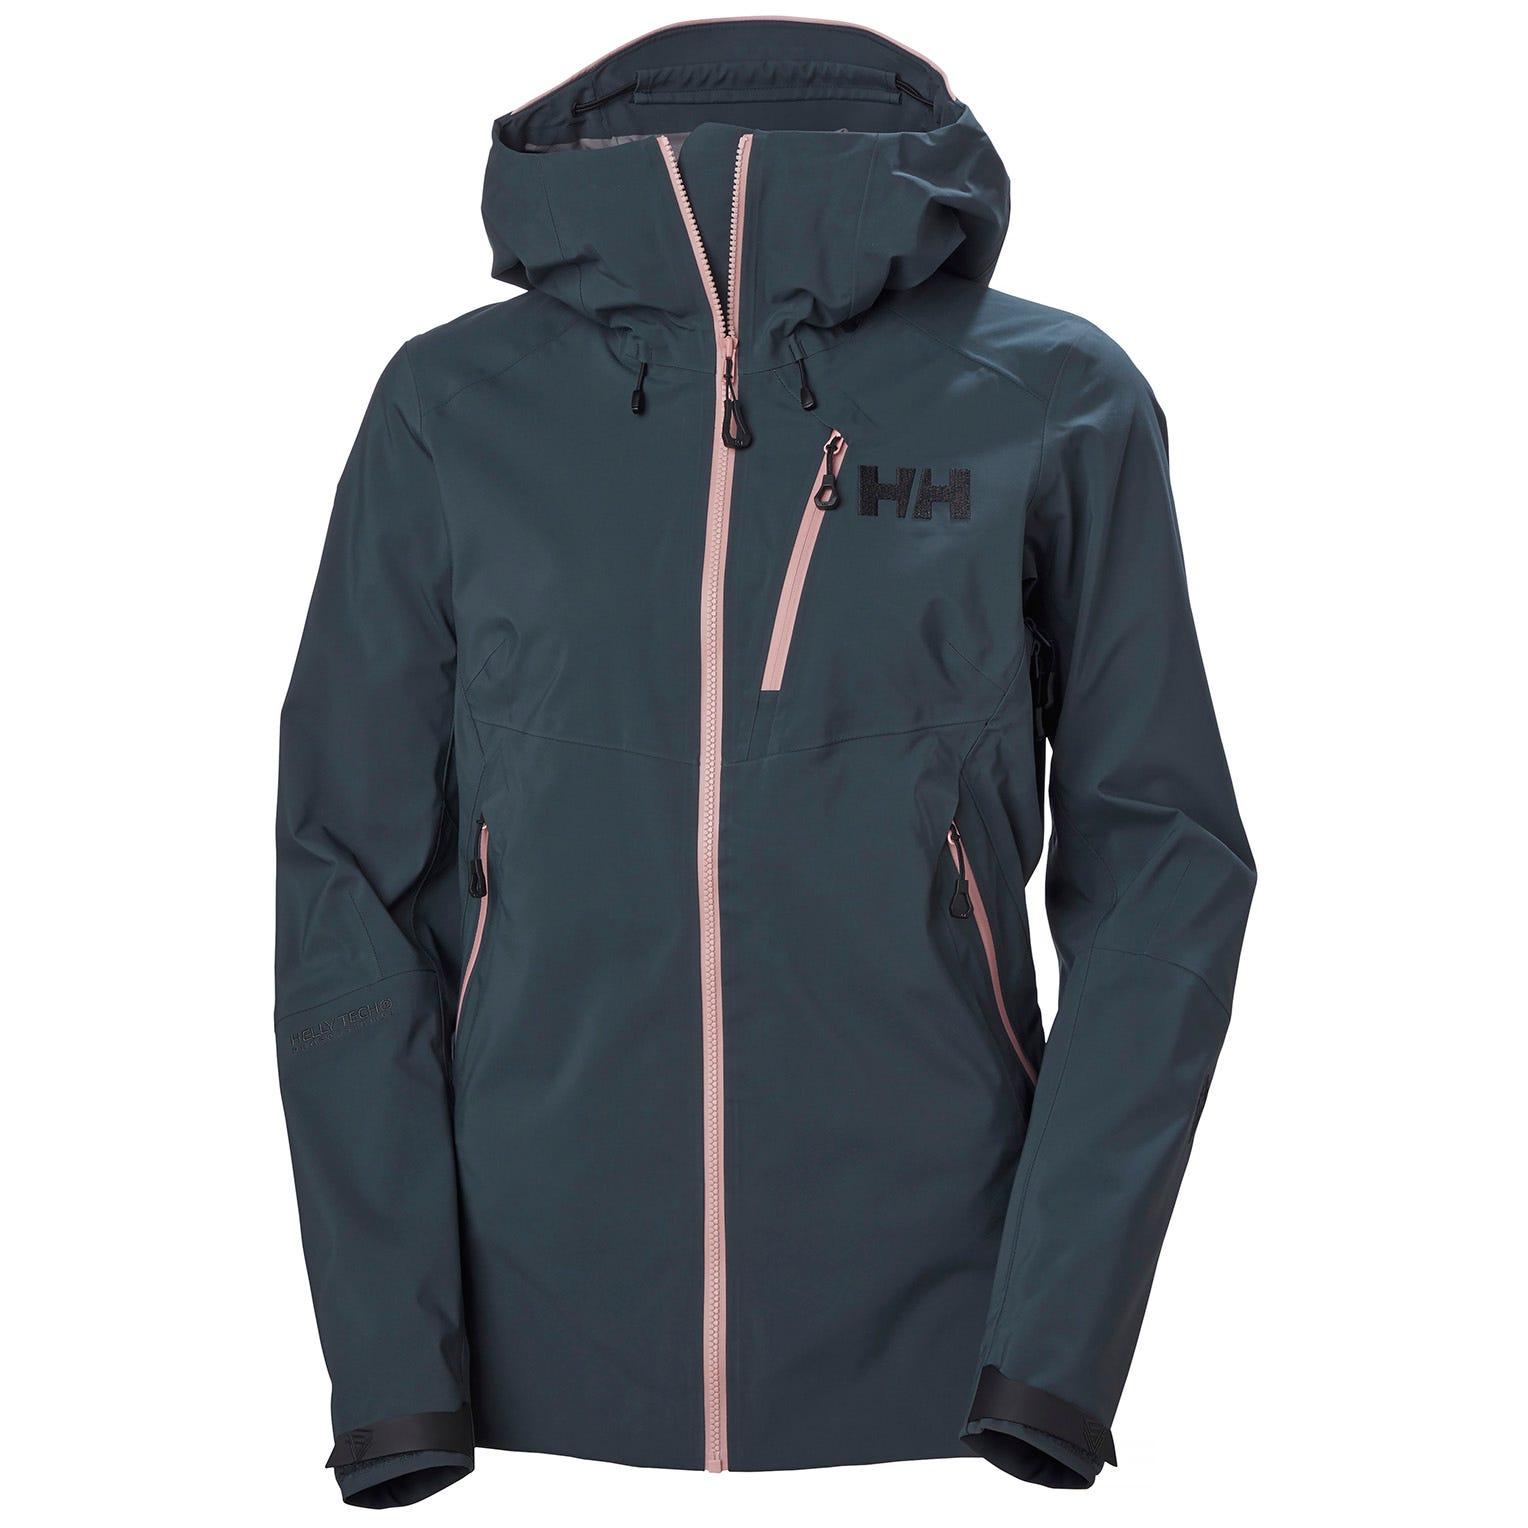 Helly Hansen Womens Hiking Jacket XL